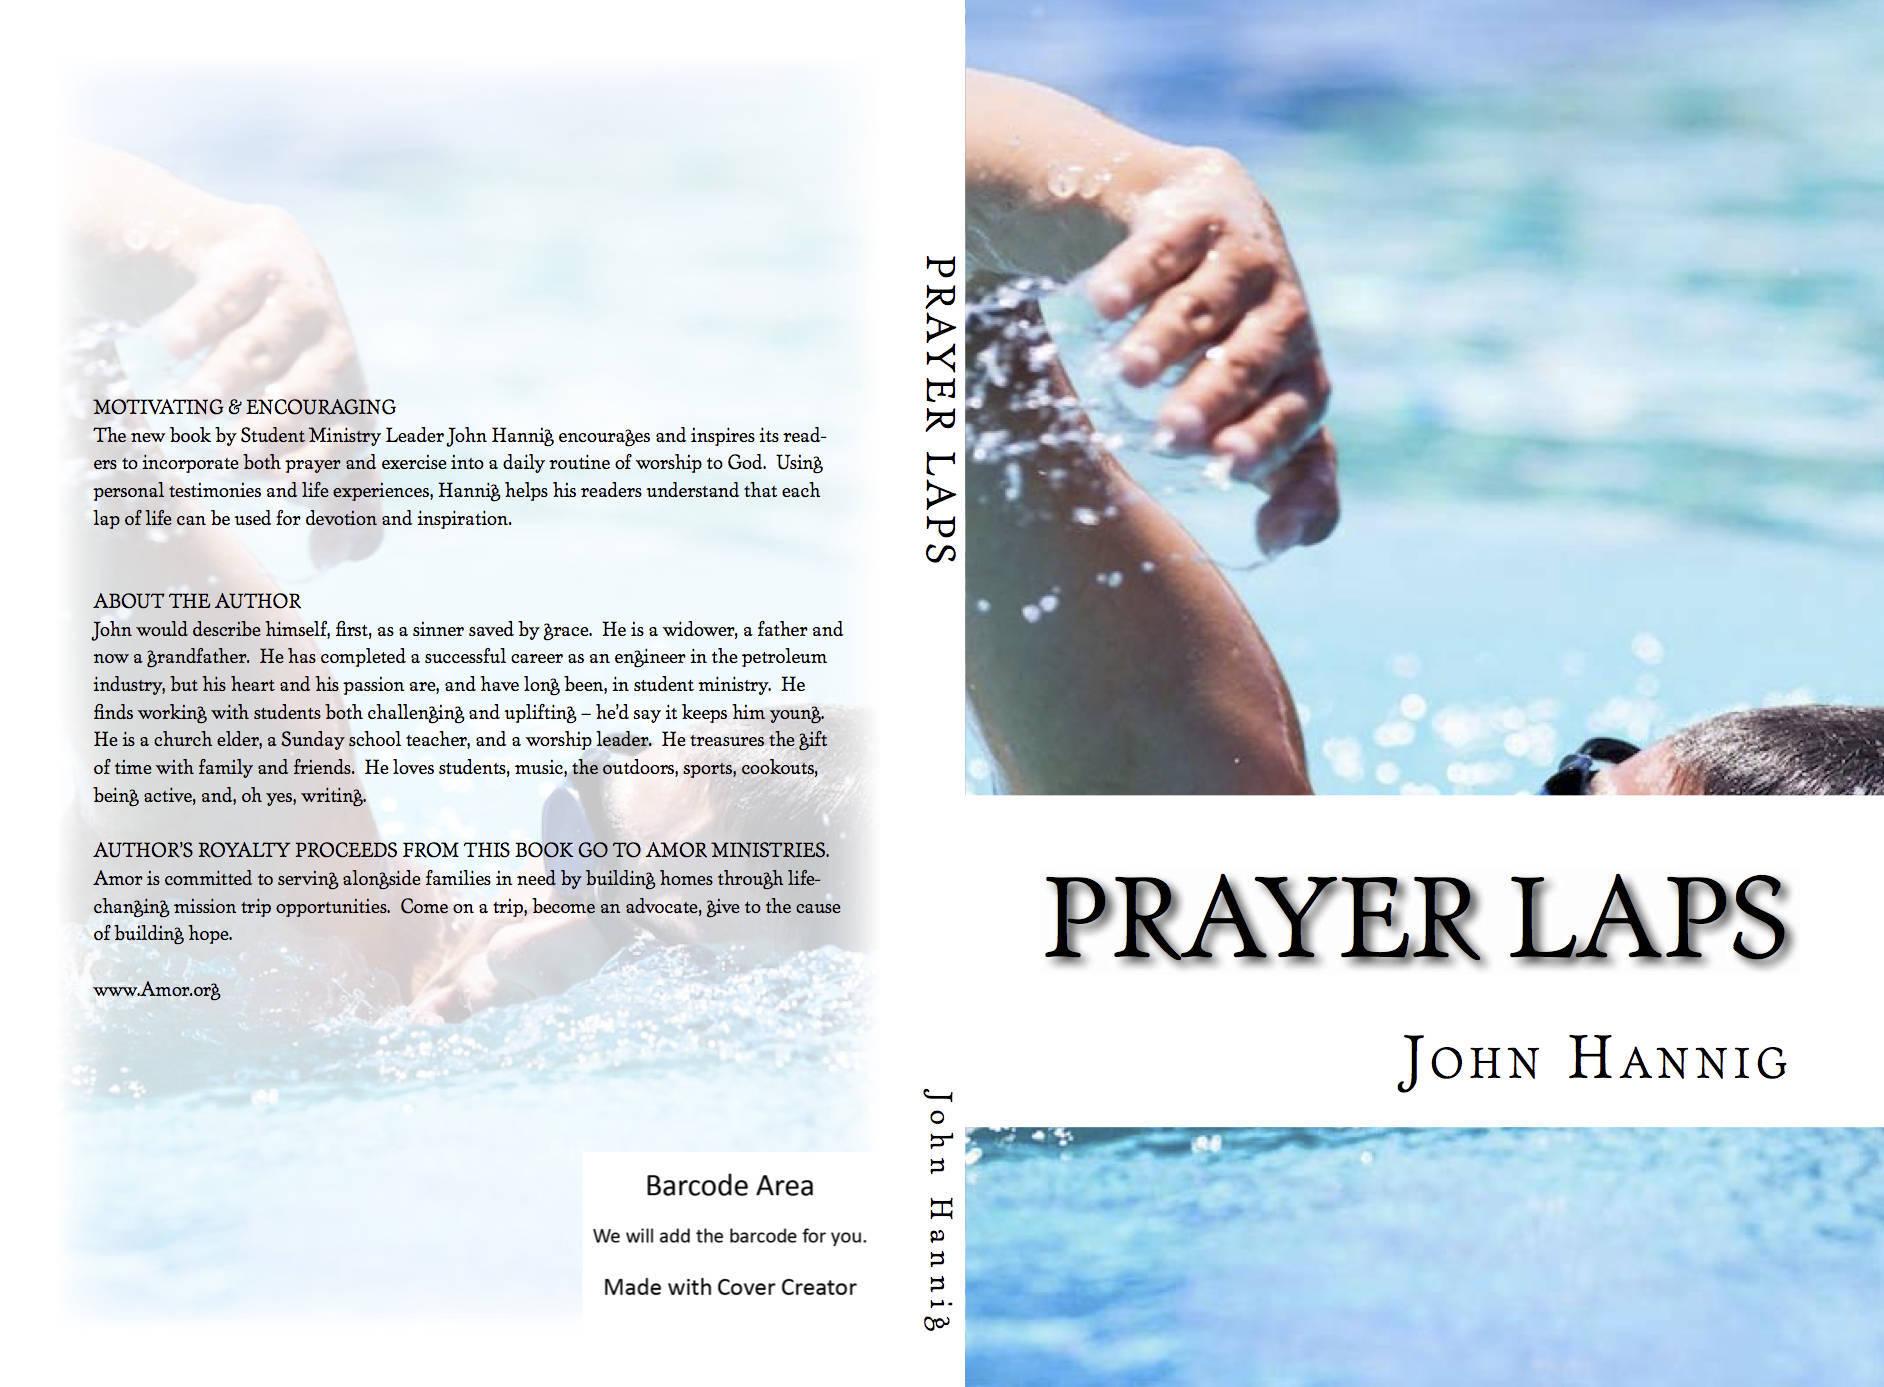 10e4b7bb1112af4963c5_Prayer_Laps_cover_1216.jpg